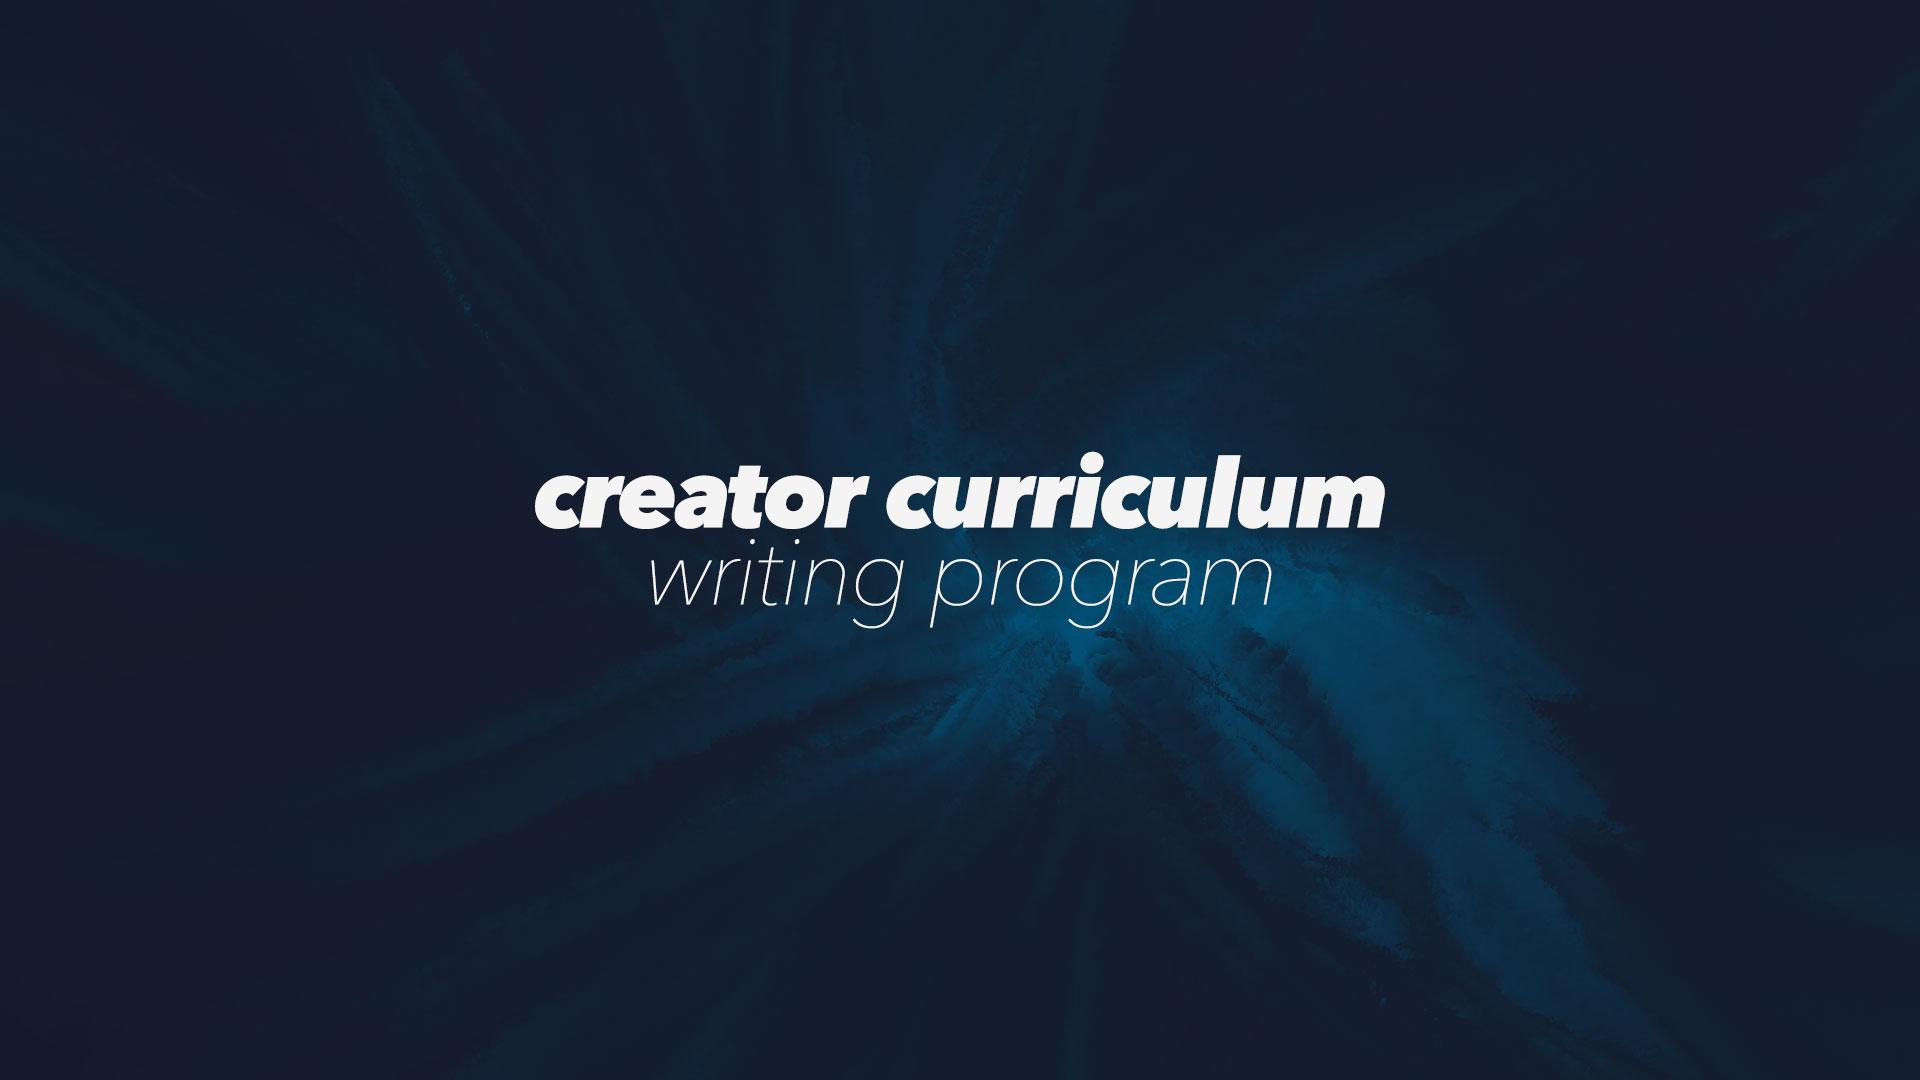 01_creator_curric.jpg